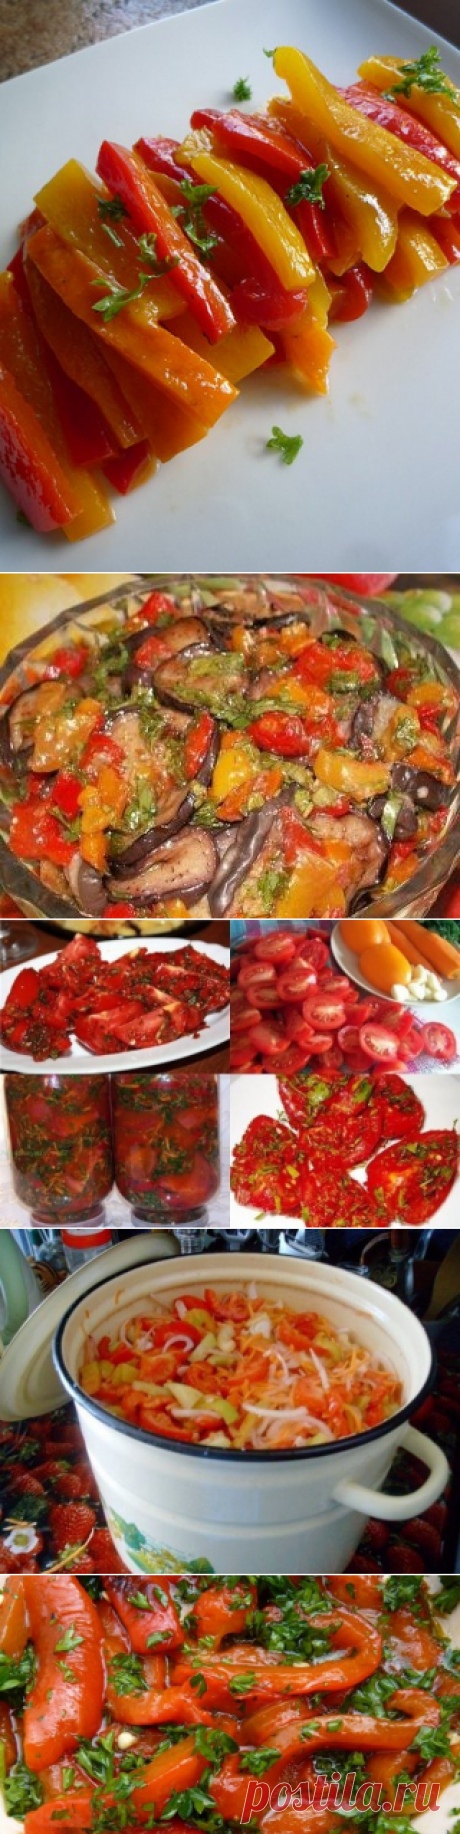 Поиск на Постиле: болгарский перец на зиму